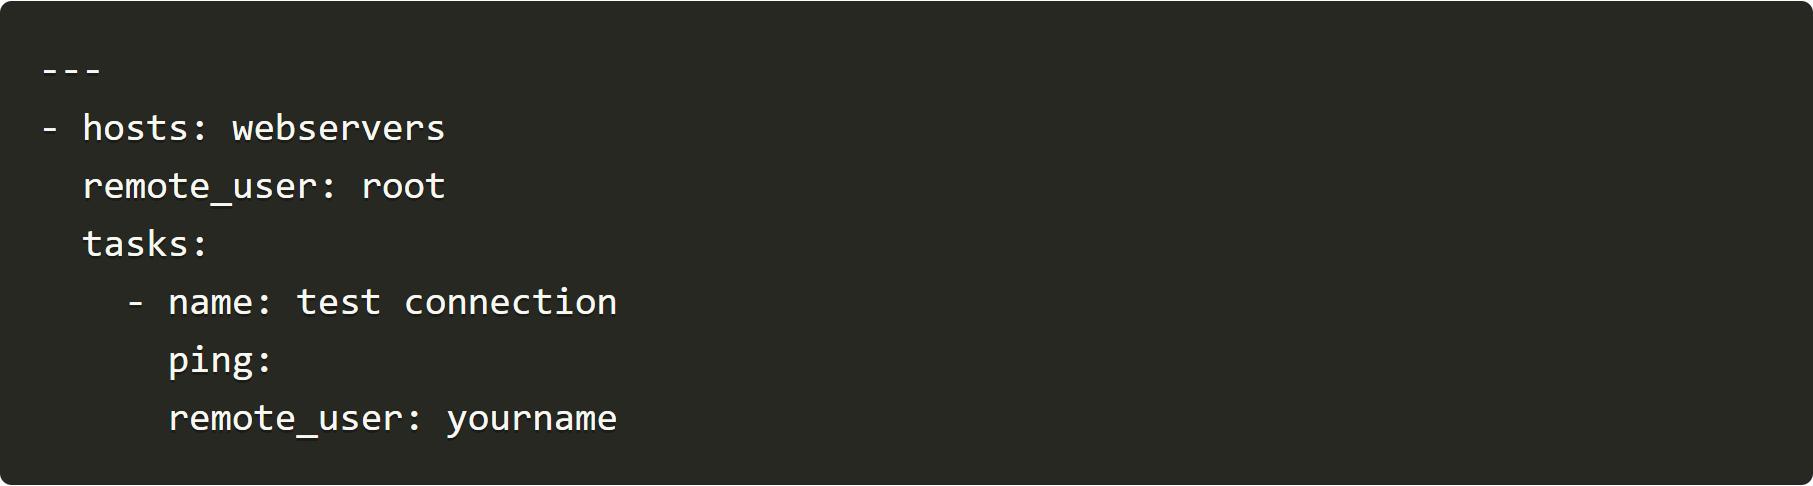 especificar usuarios remote_user root